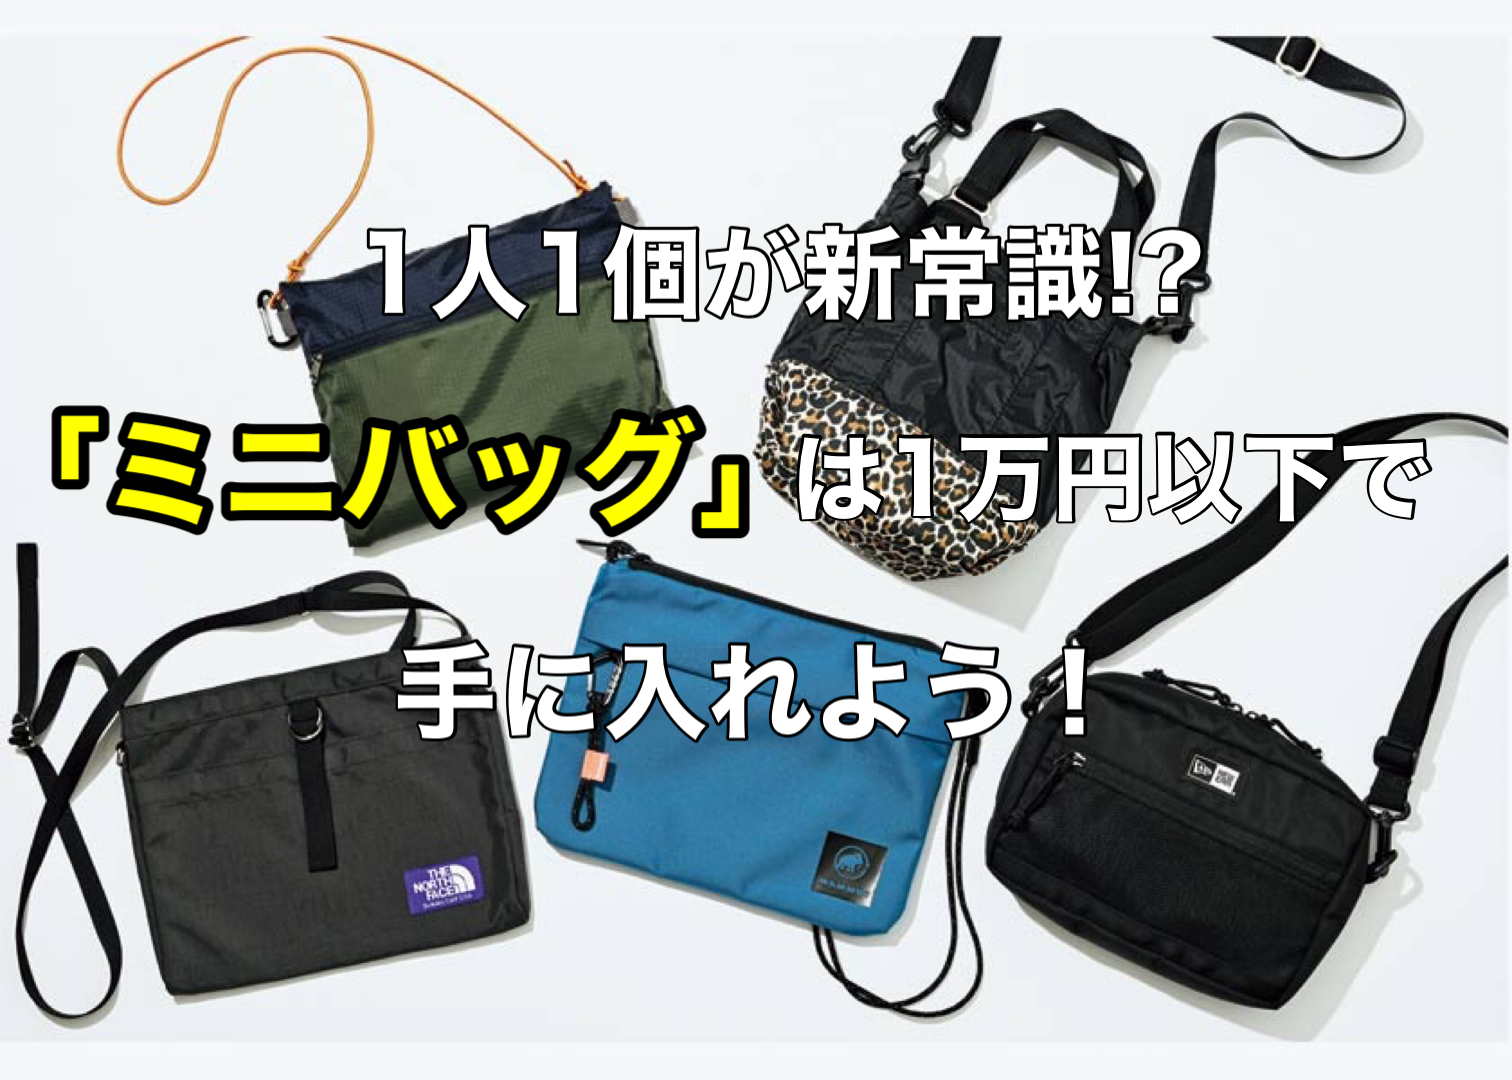 https://cdn.fineboys-online.jp/thegear/content/theme/img/org/article/3554/main.jpg?t=1629526602